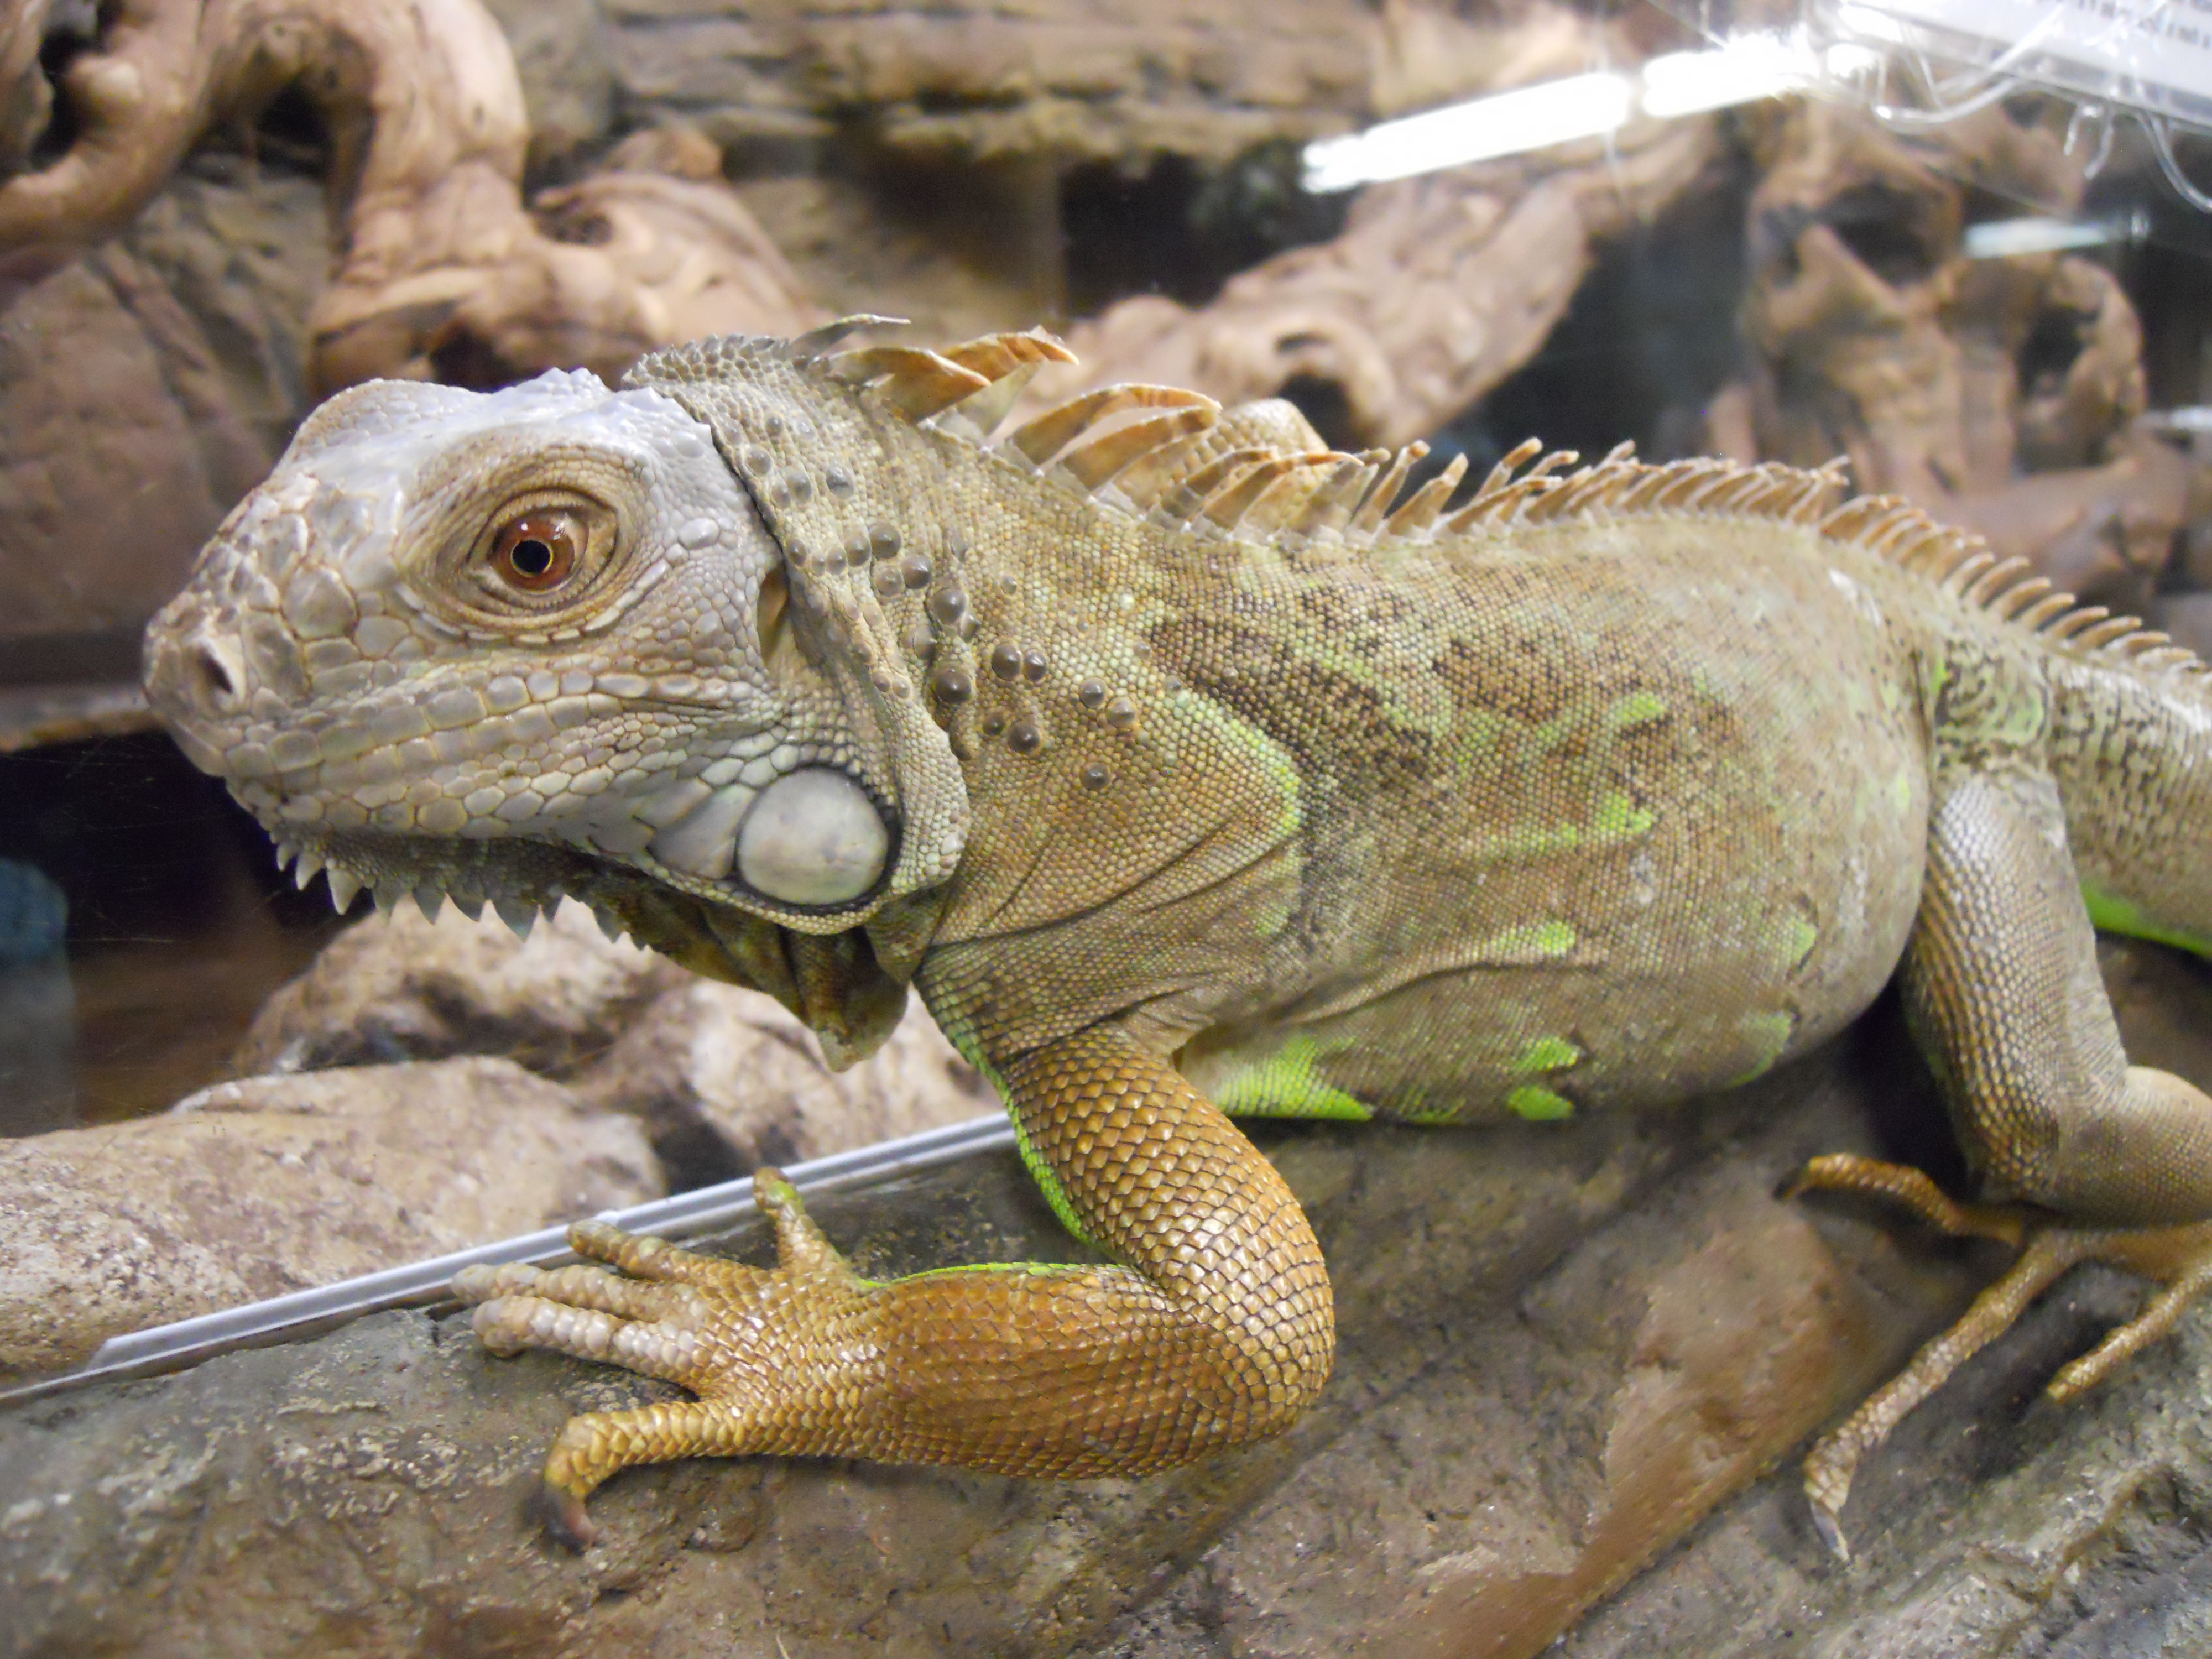 mom u2013 lizard wrangler phoebebirdink